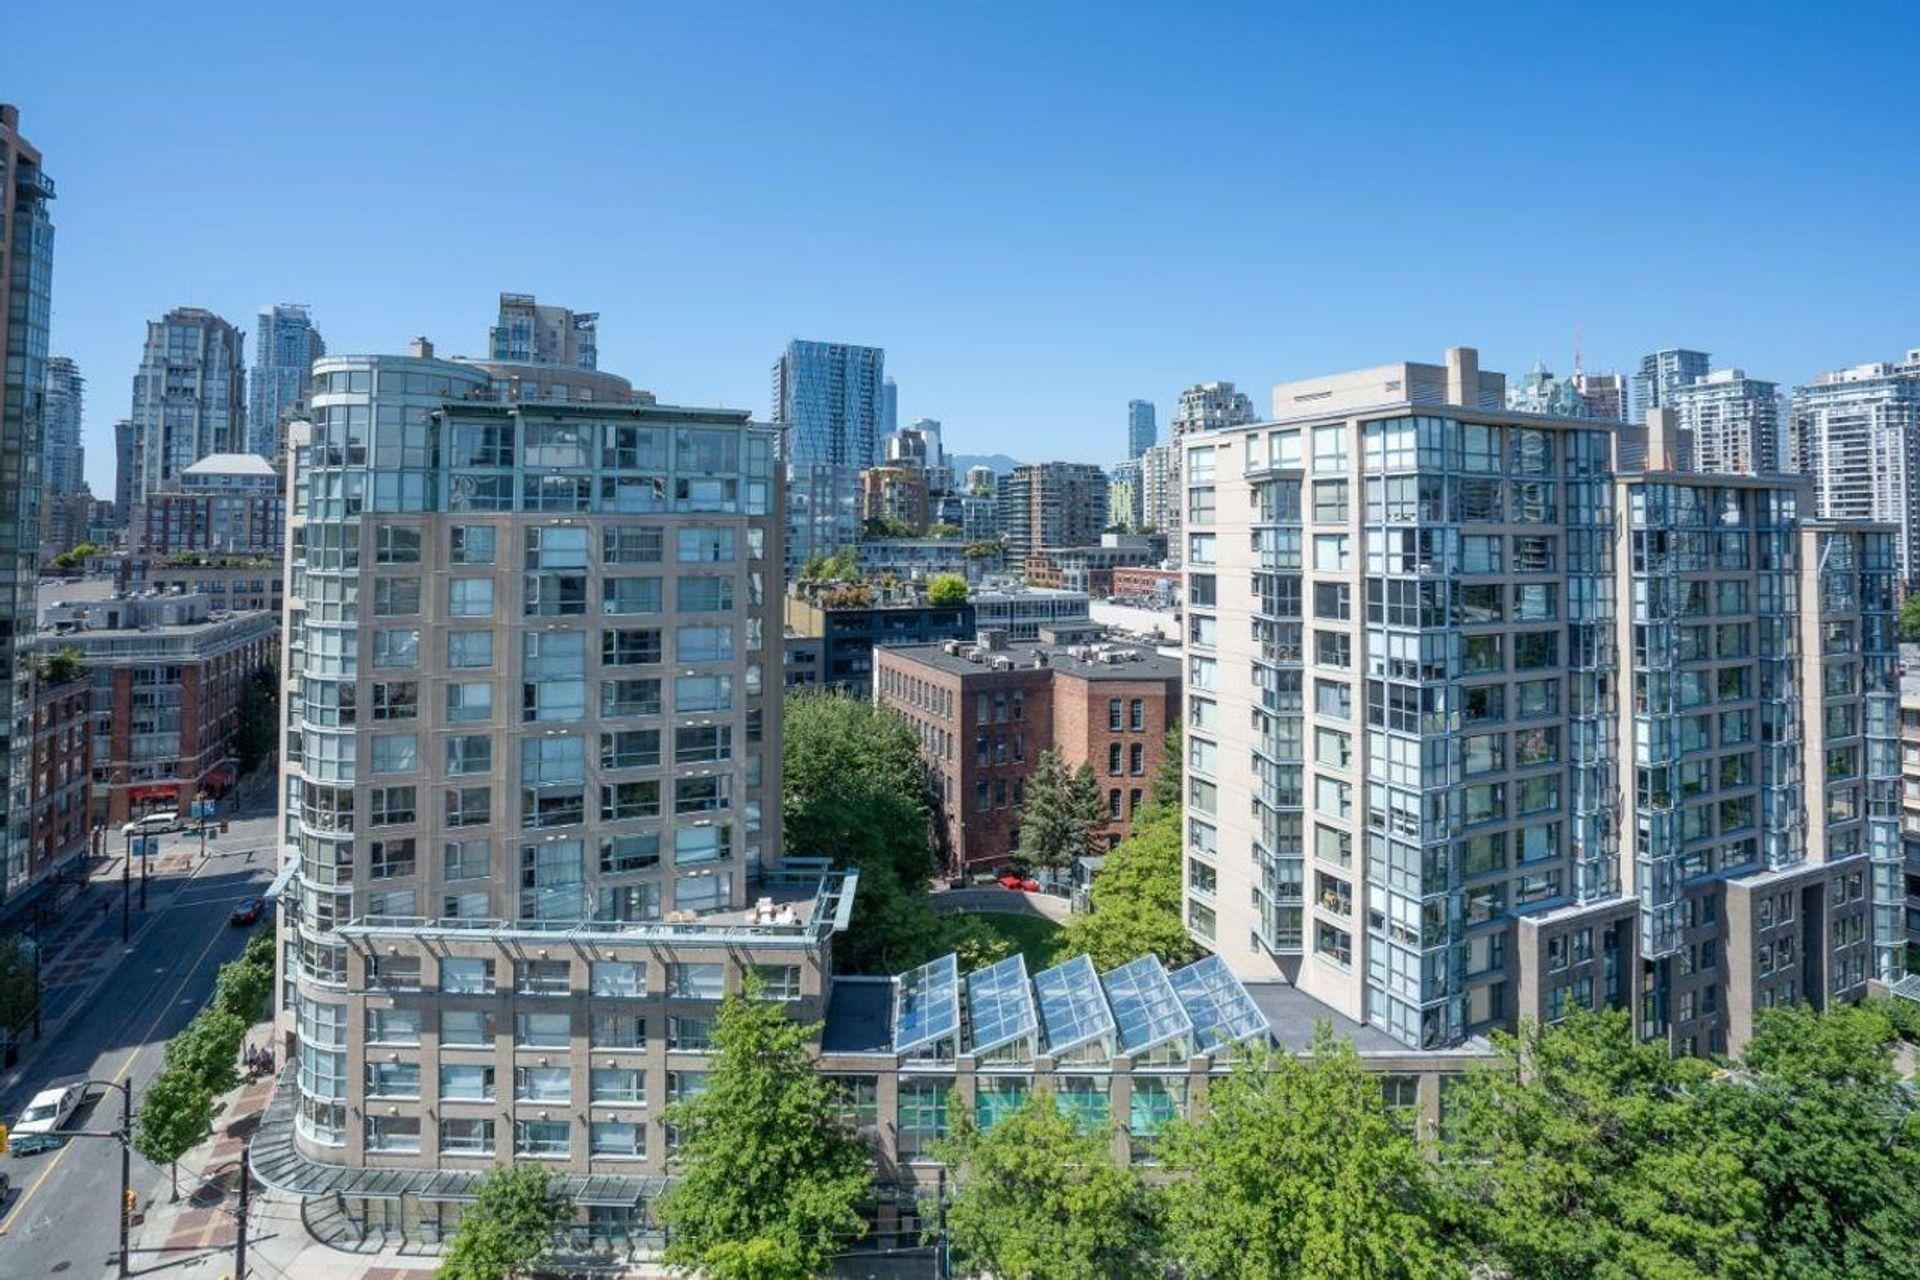 189-davie-street-yaletown-vancouver-west-13 at 1601 - 189 Davie Street, Yaletown, Vancouver West